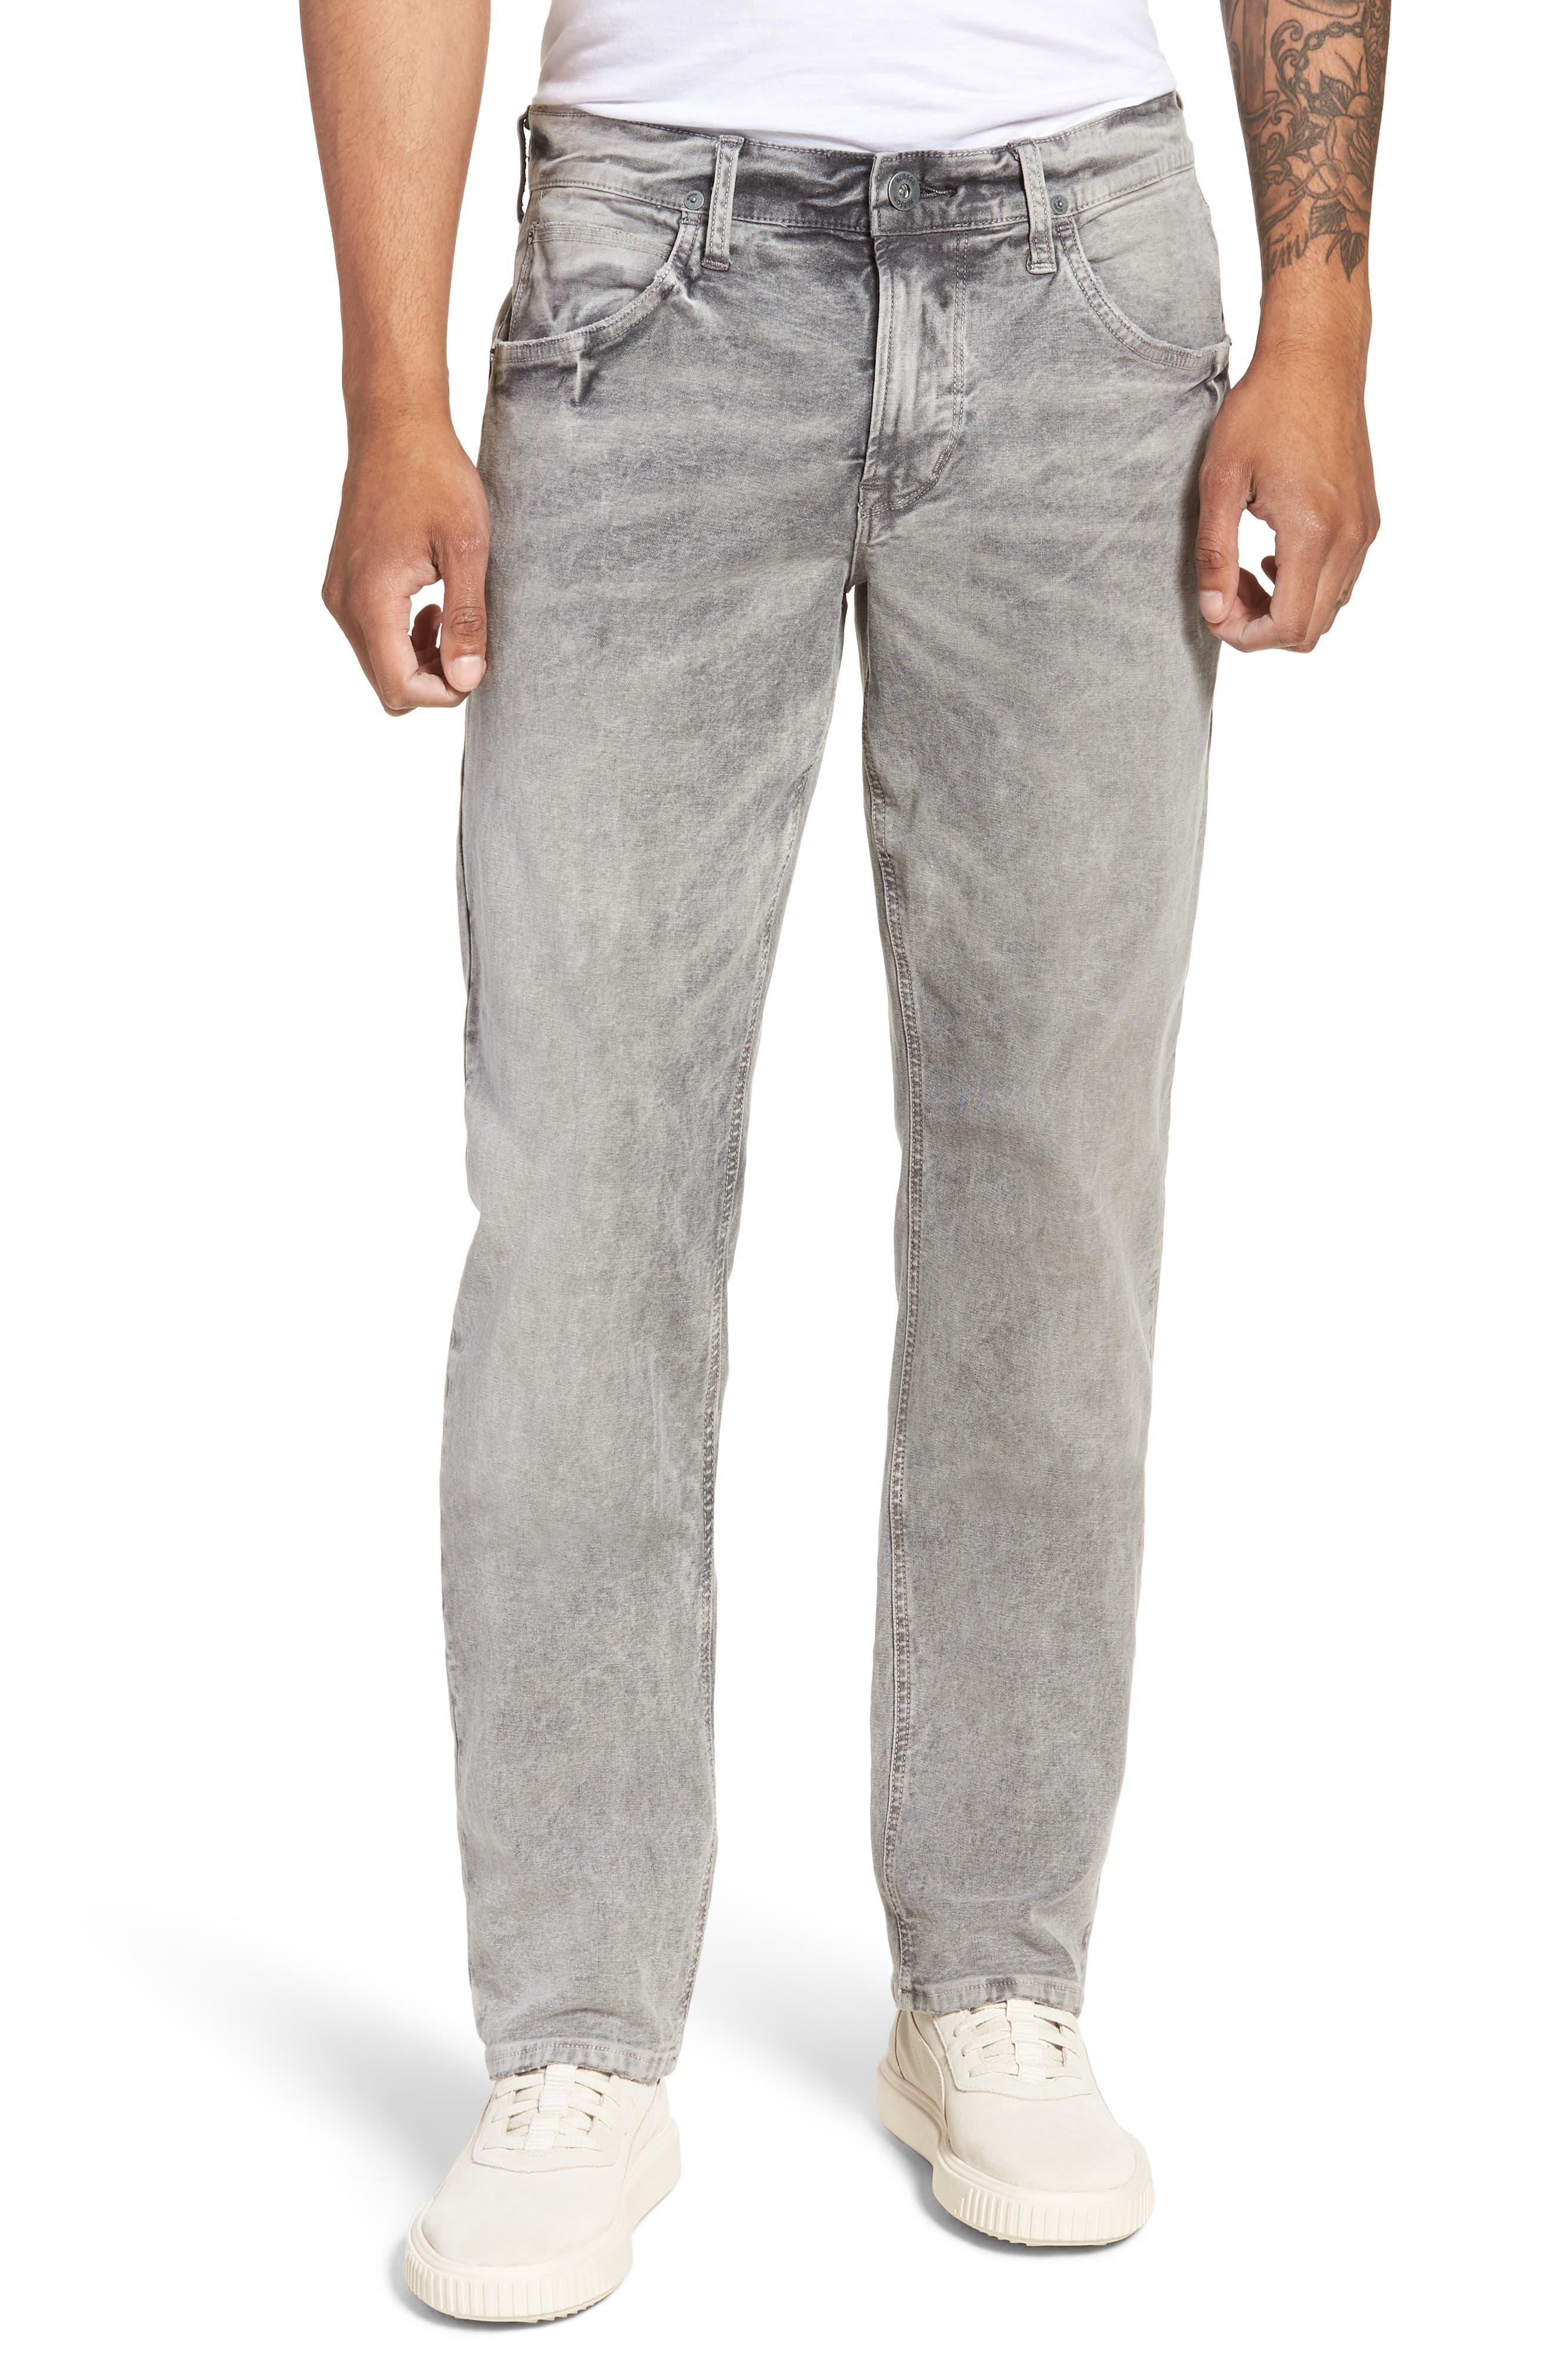 Blake Slim Fit Jeans,                             Main thumbnail 1, color,                             Deceiving